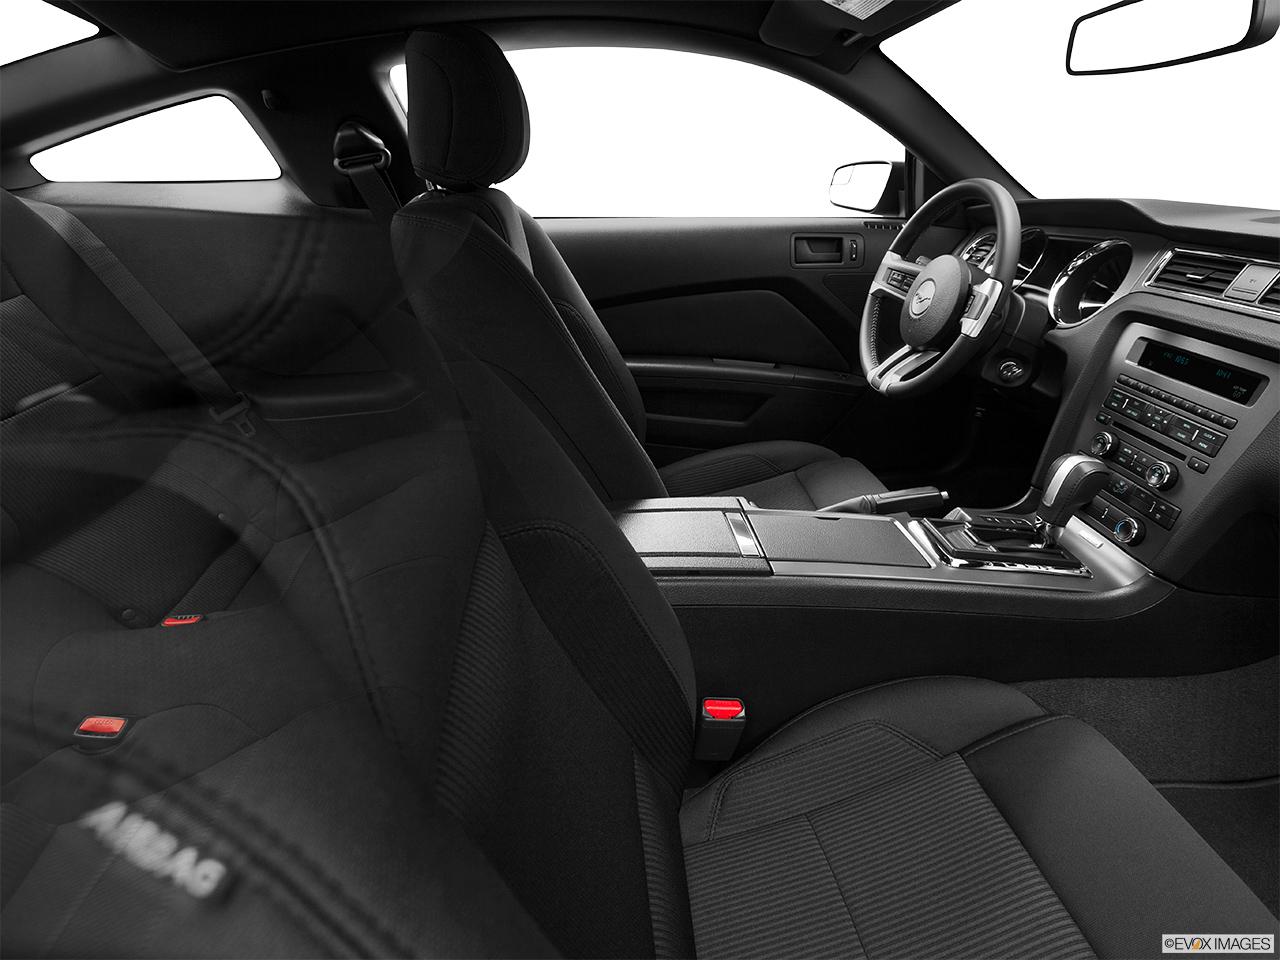 2014 ford mustang coupe v6 fake buck shot interior from passenger b pillar